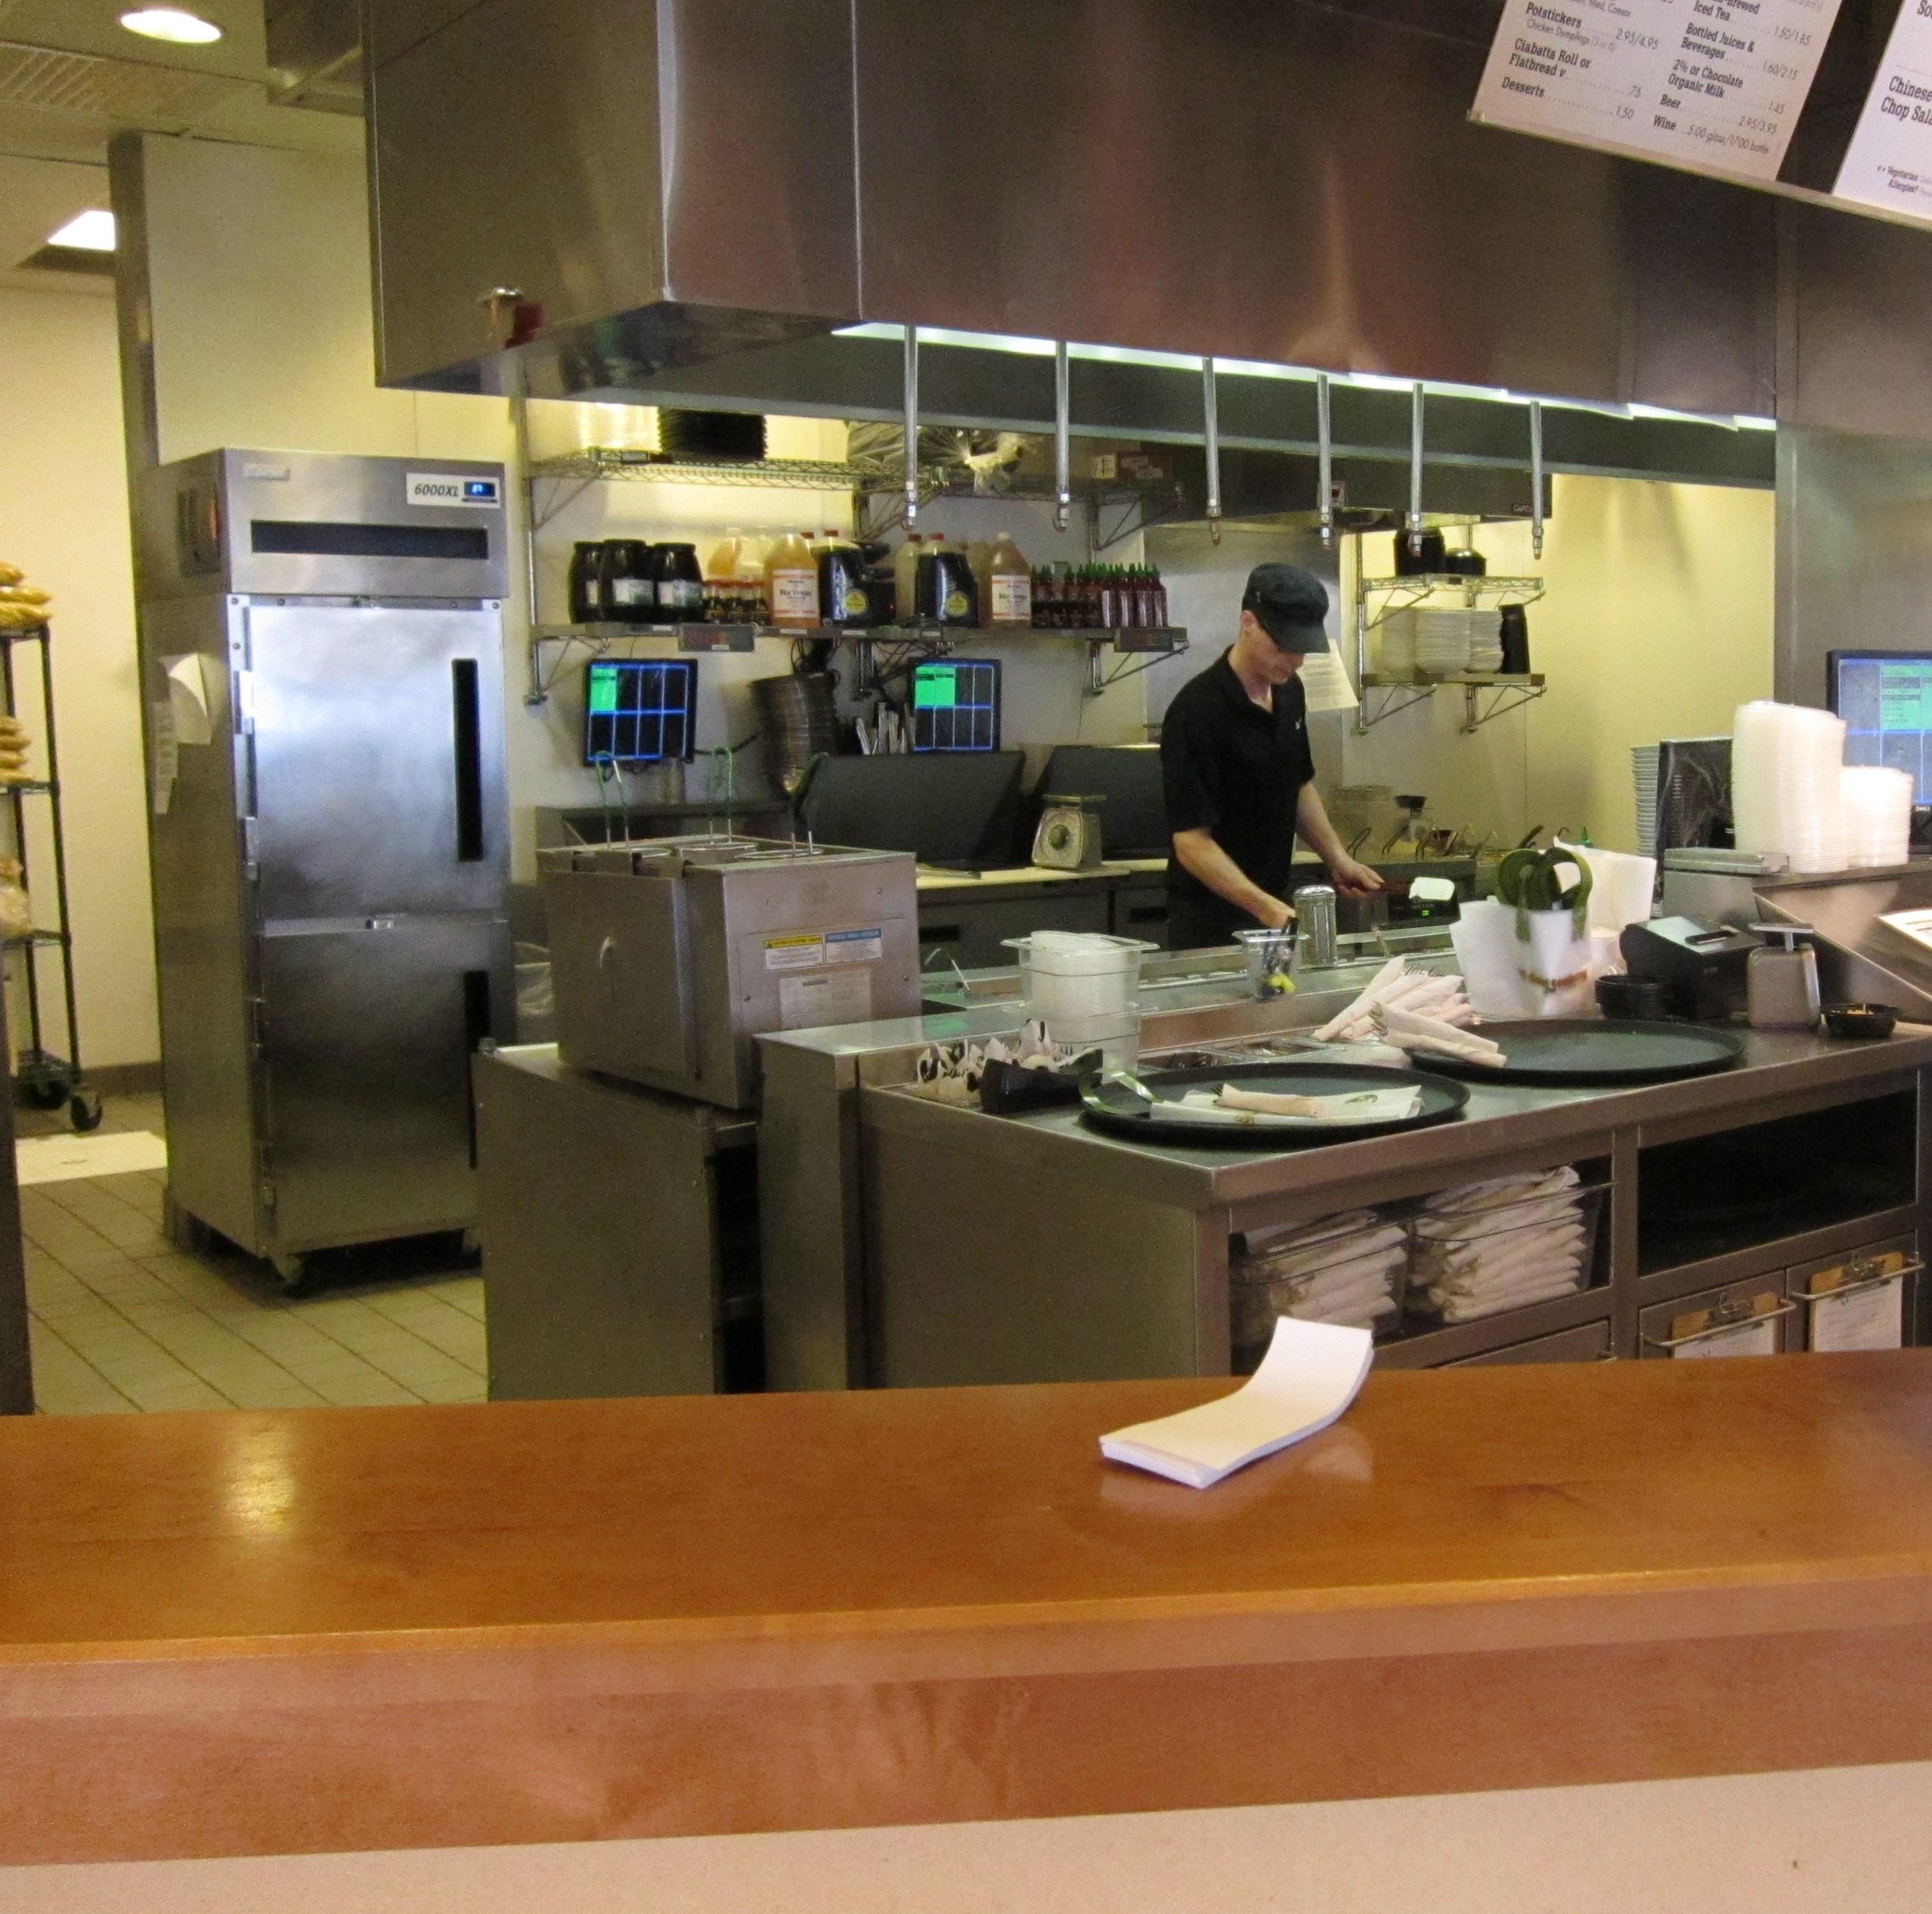 Filenoodles company kitchen jpg